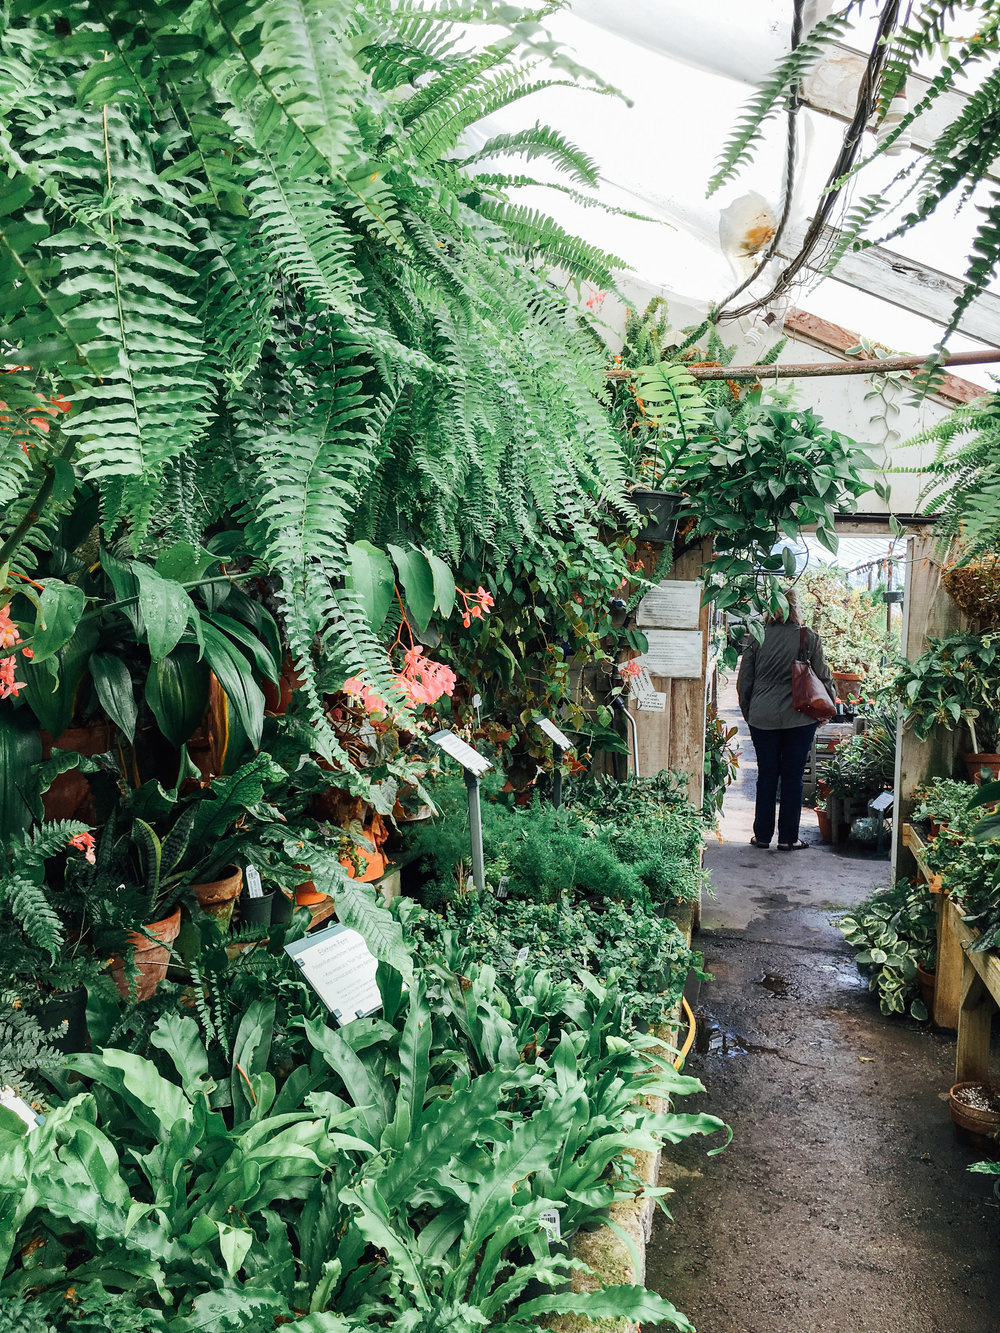 Peckham's Greenhouse - Little Compton Rhode Island